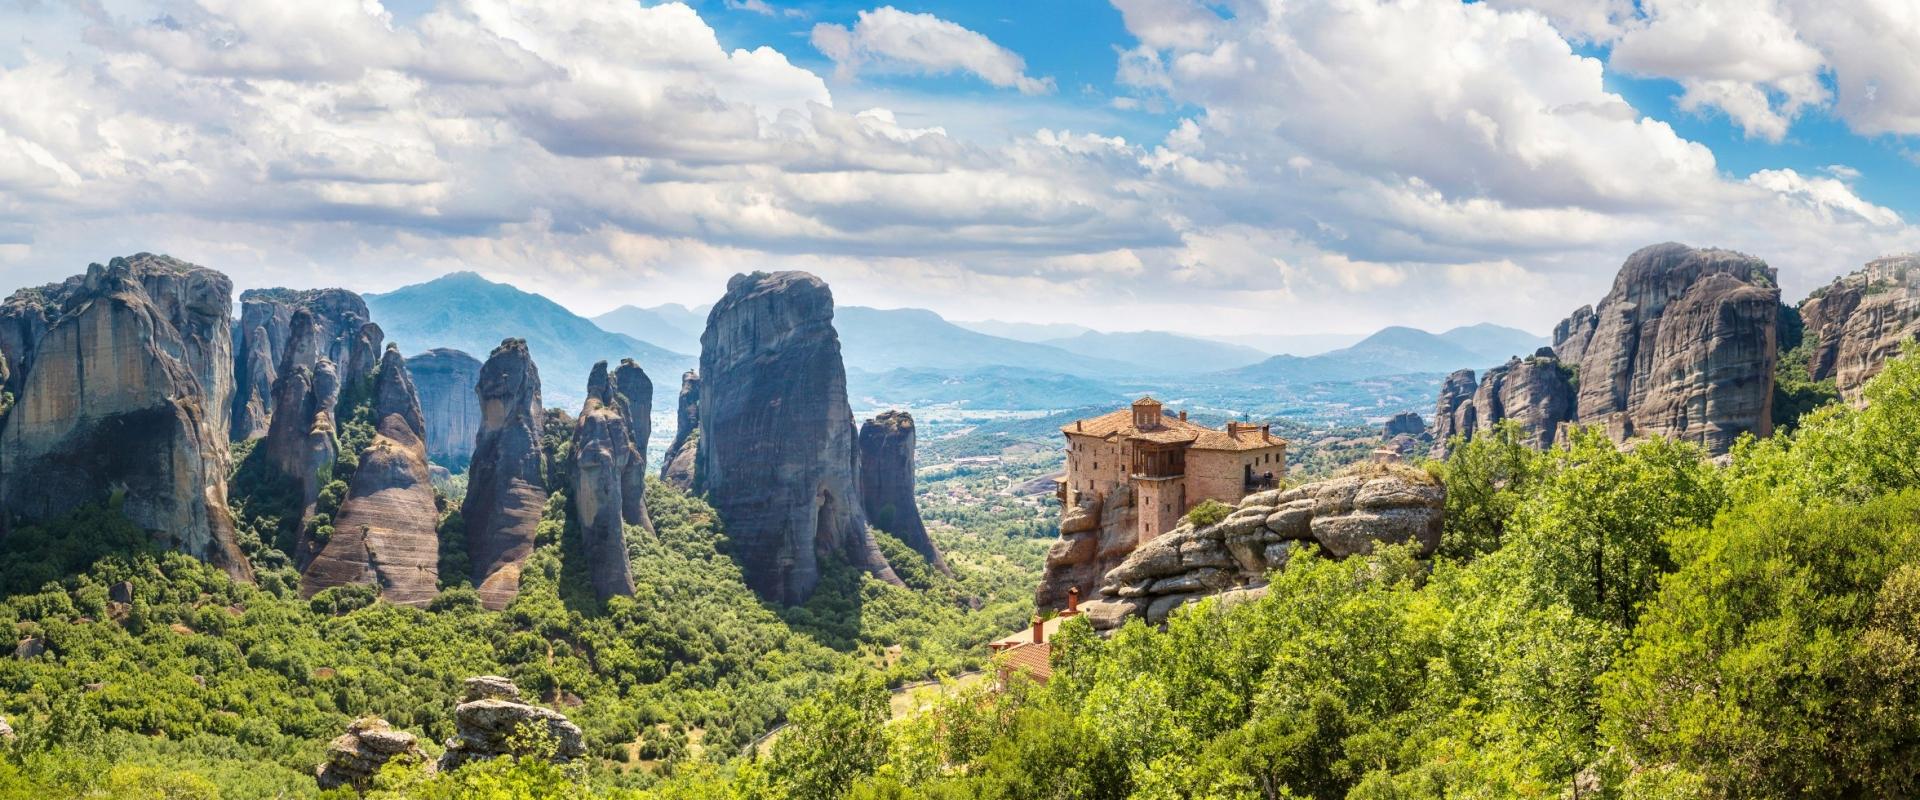 Rocks and monasteries in Meteora, Greece